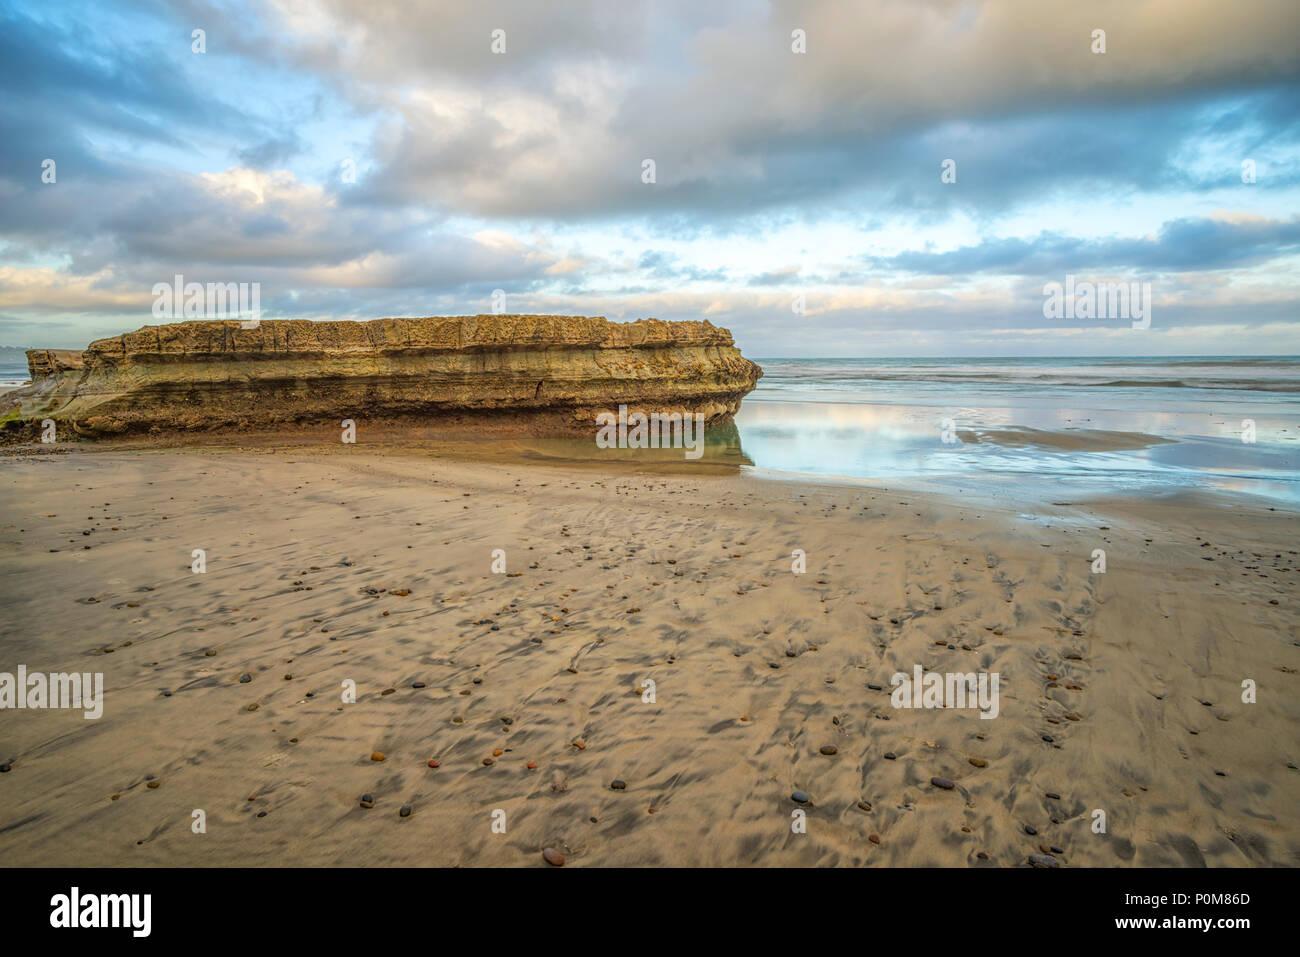 Torrey Pines State Beach, La Jolla, California, USA. A view of Flat Rock. - Stock Image